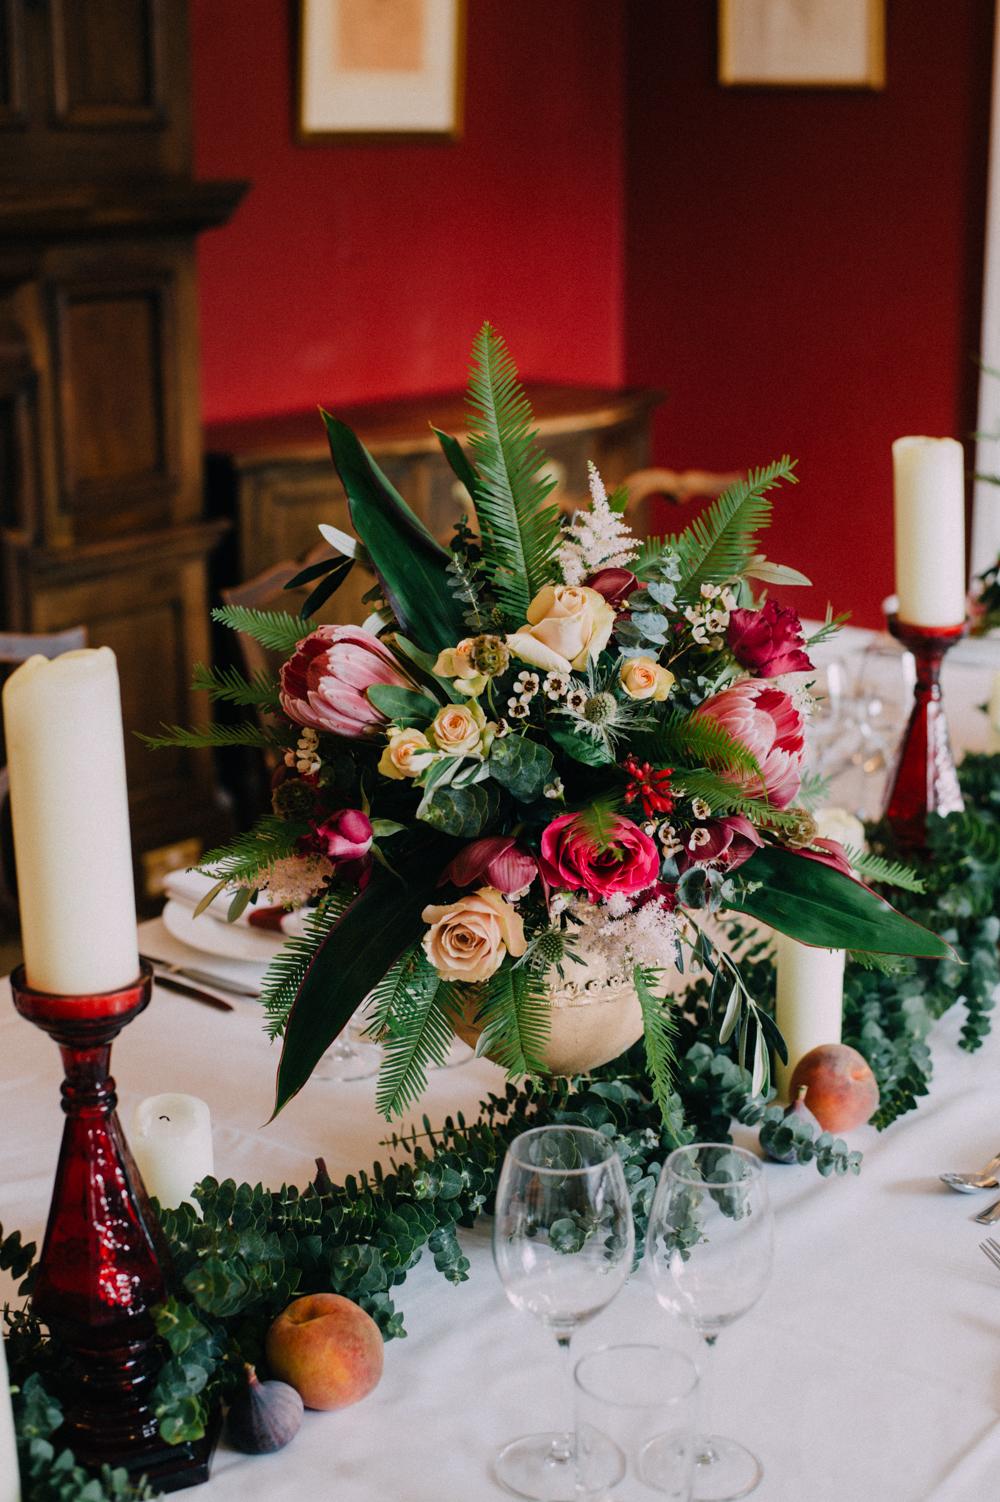 oxford_wedding_ladiesandlord-22